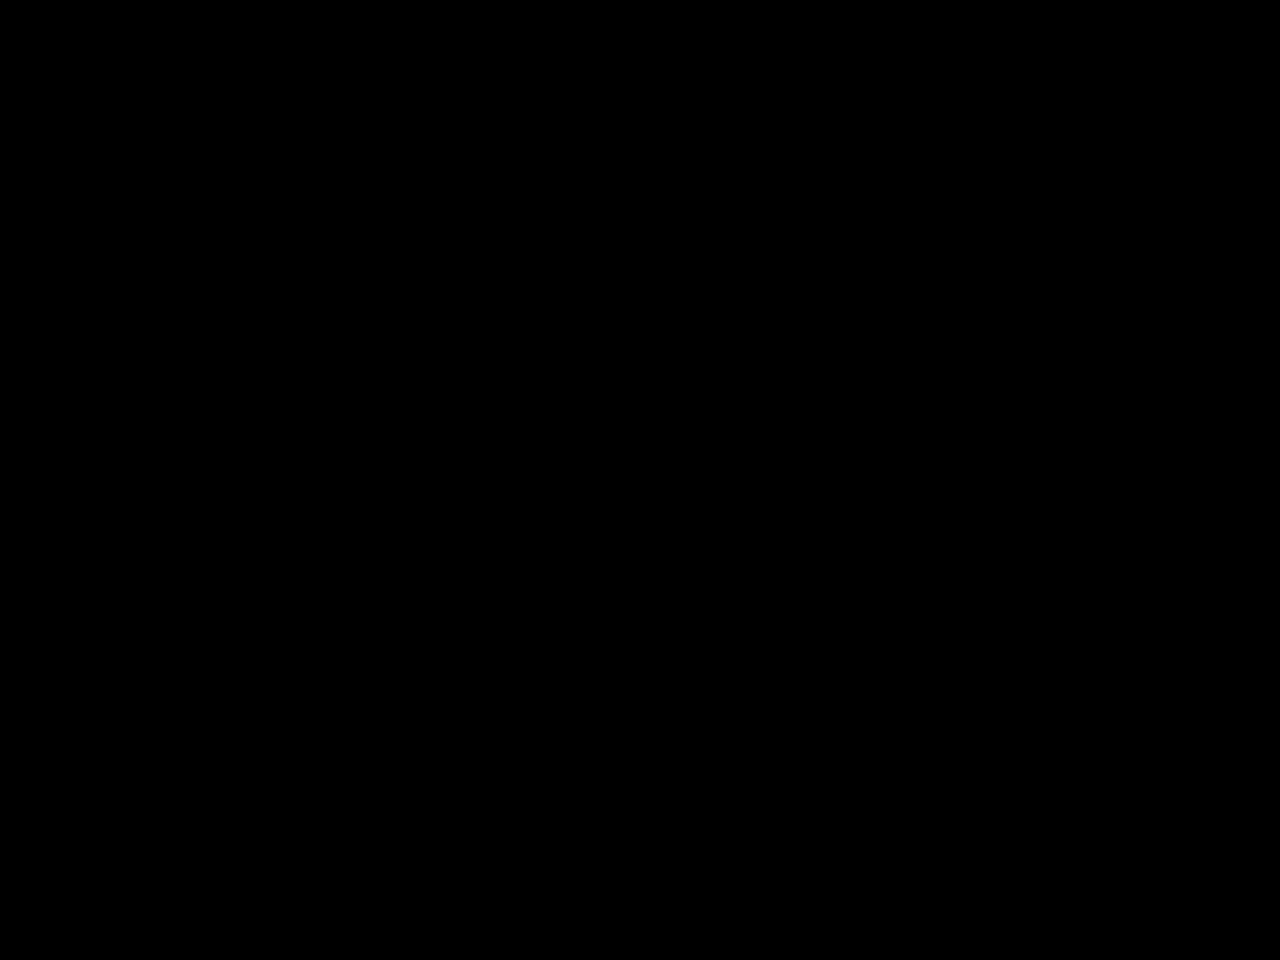 1280x960 Infinity Symbol Vector Clipart Best Yyhg2x Clipart